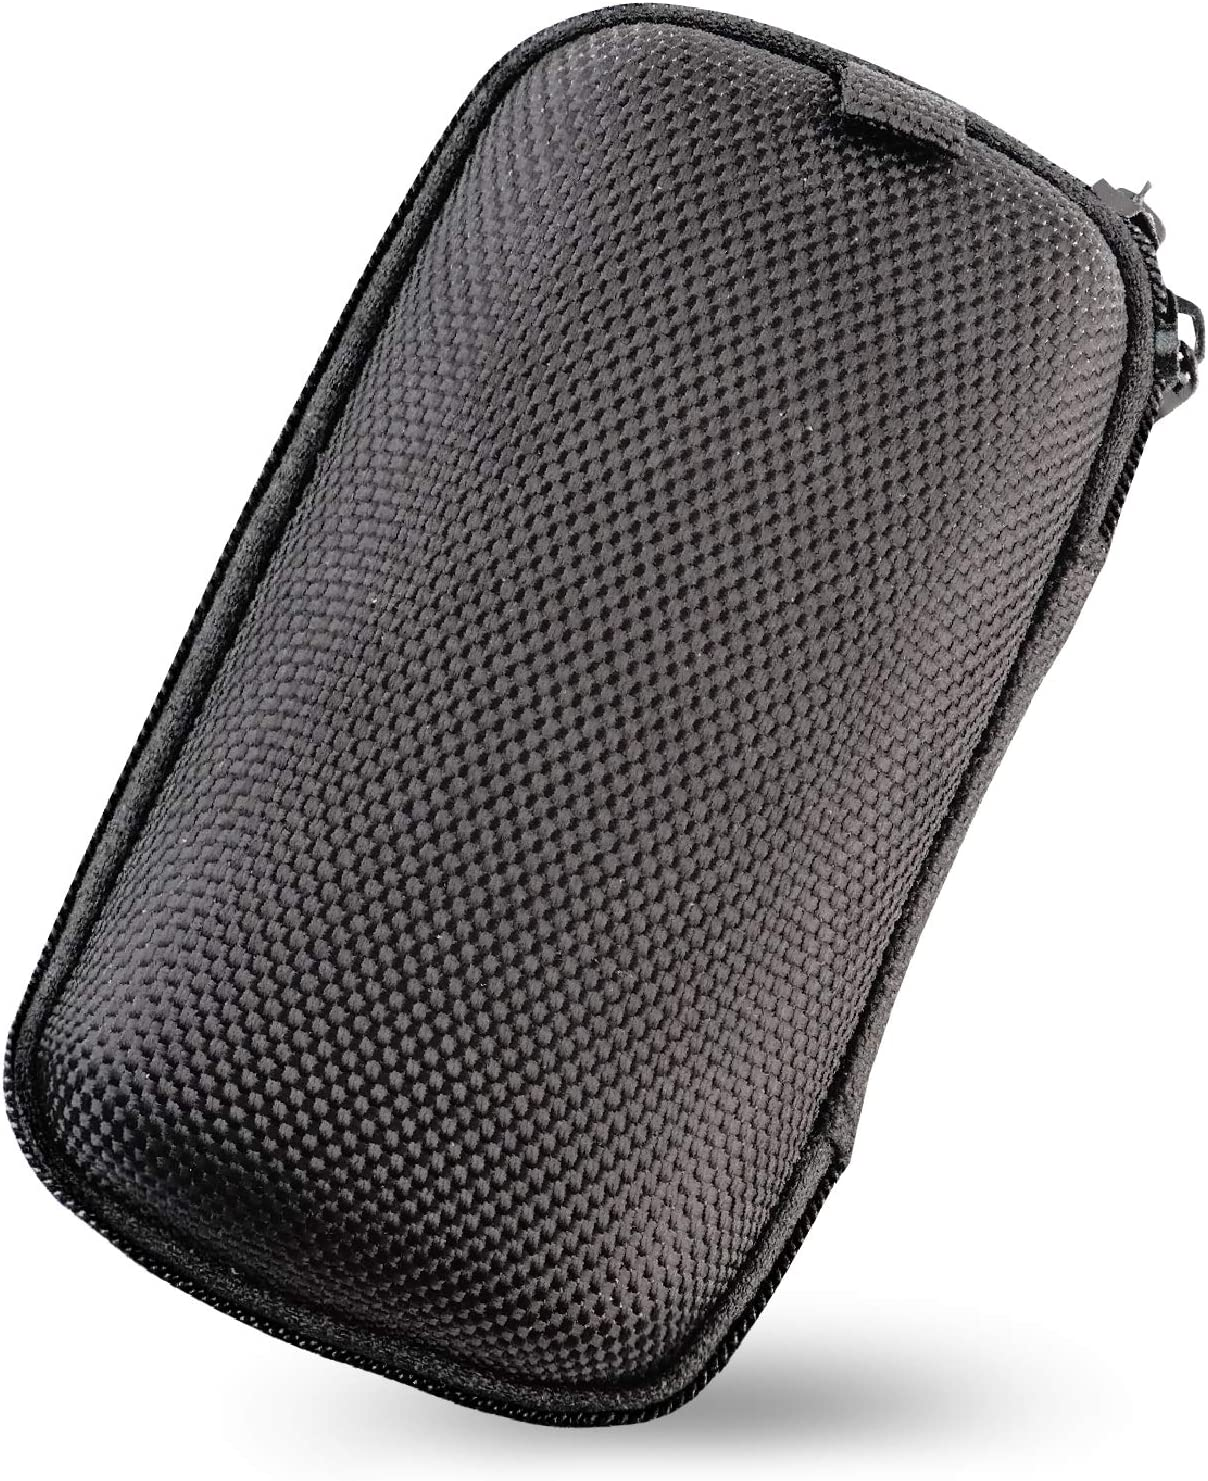 Portable Protection Hard 2021 autumn and winter new Eva Case Universal Travel Metatze Great interest D Bag